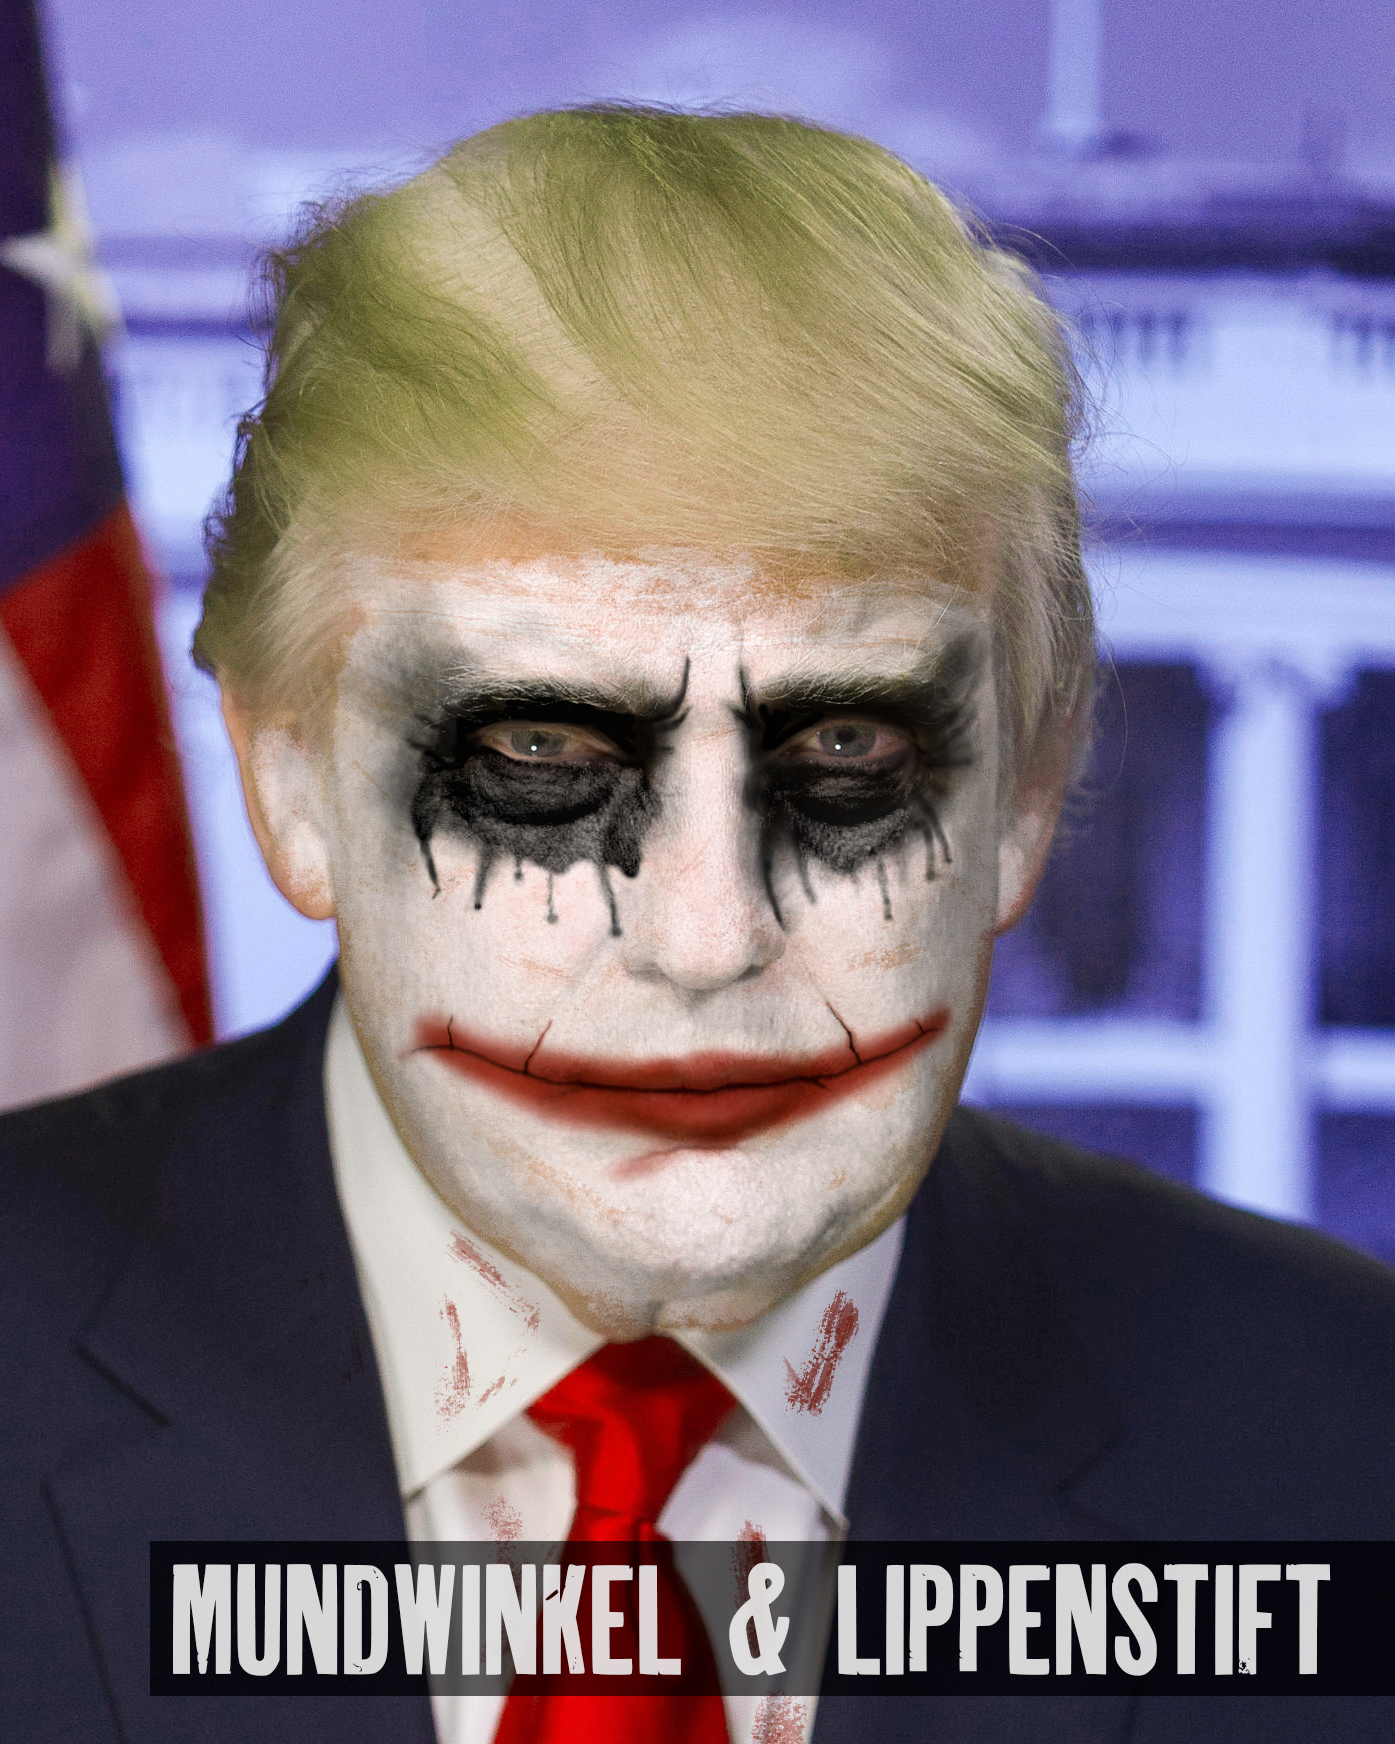 06 Donald Trump Joker